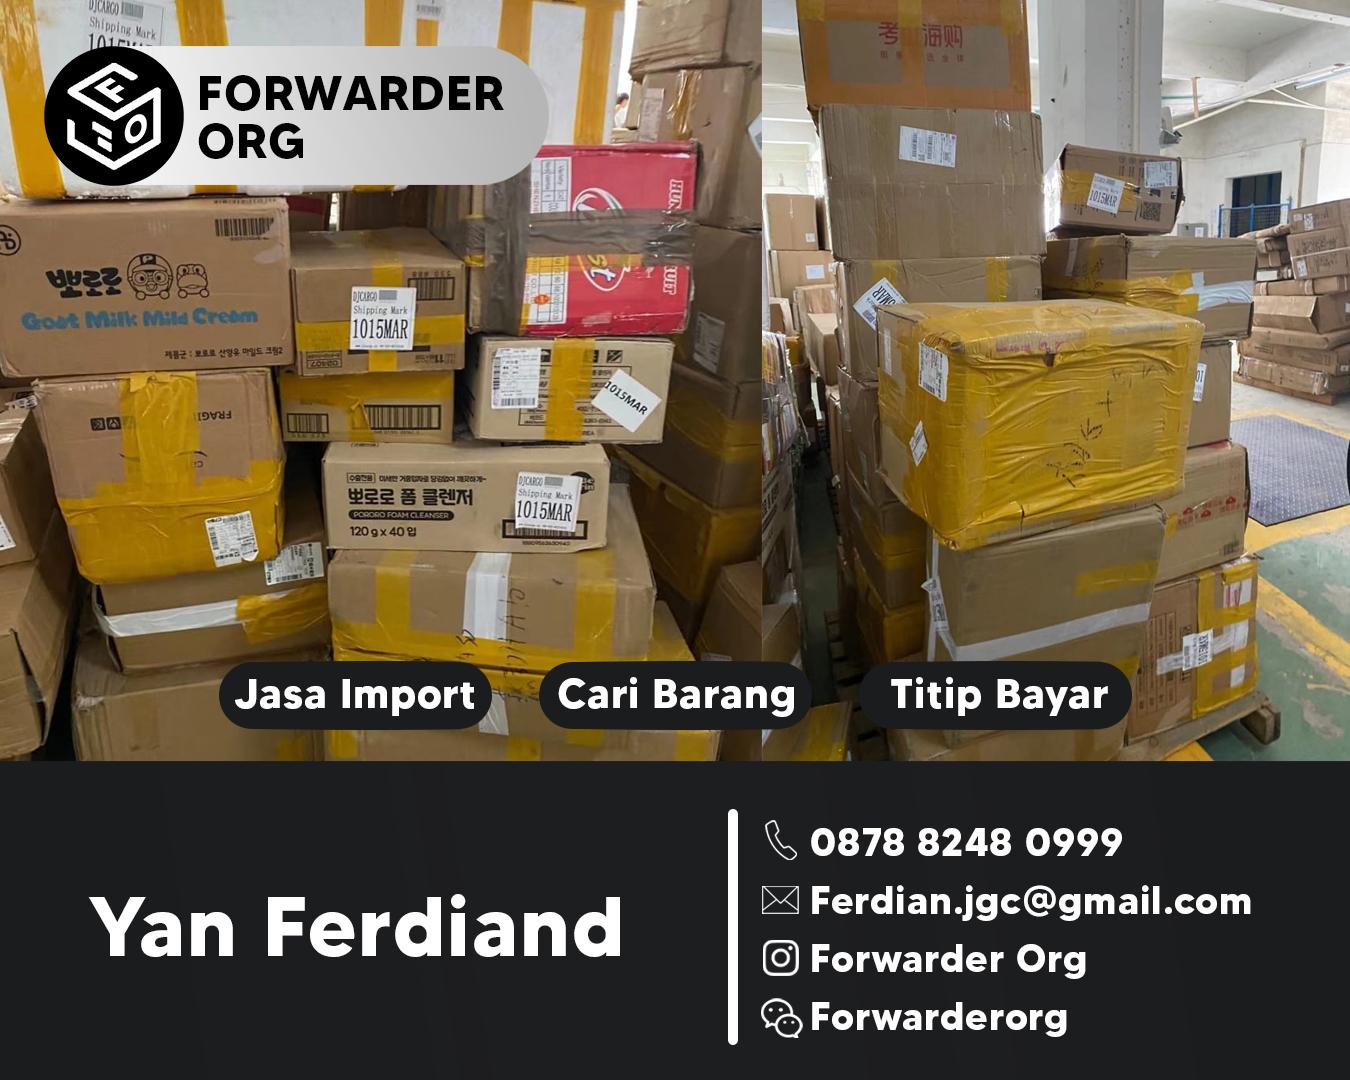 Import Barang dari Singapore Termurah Terpercaya | FORWARDER ORG